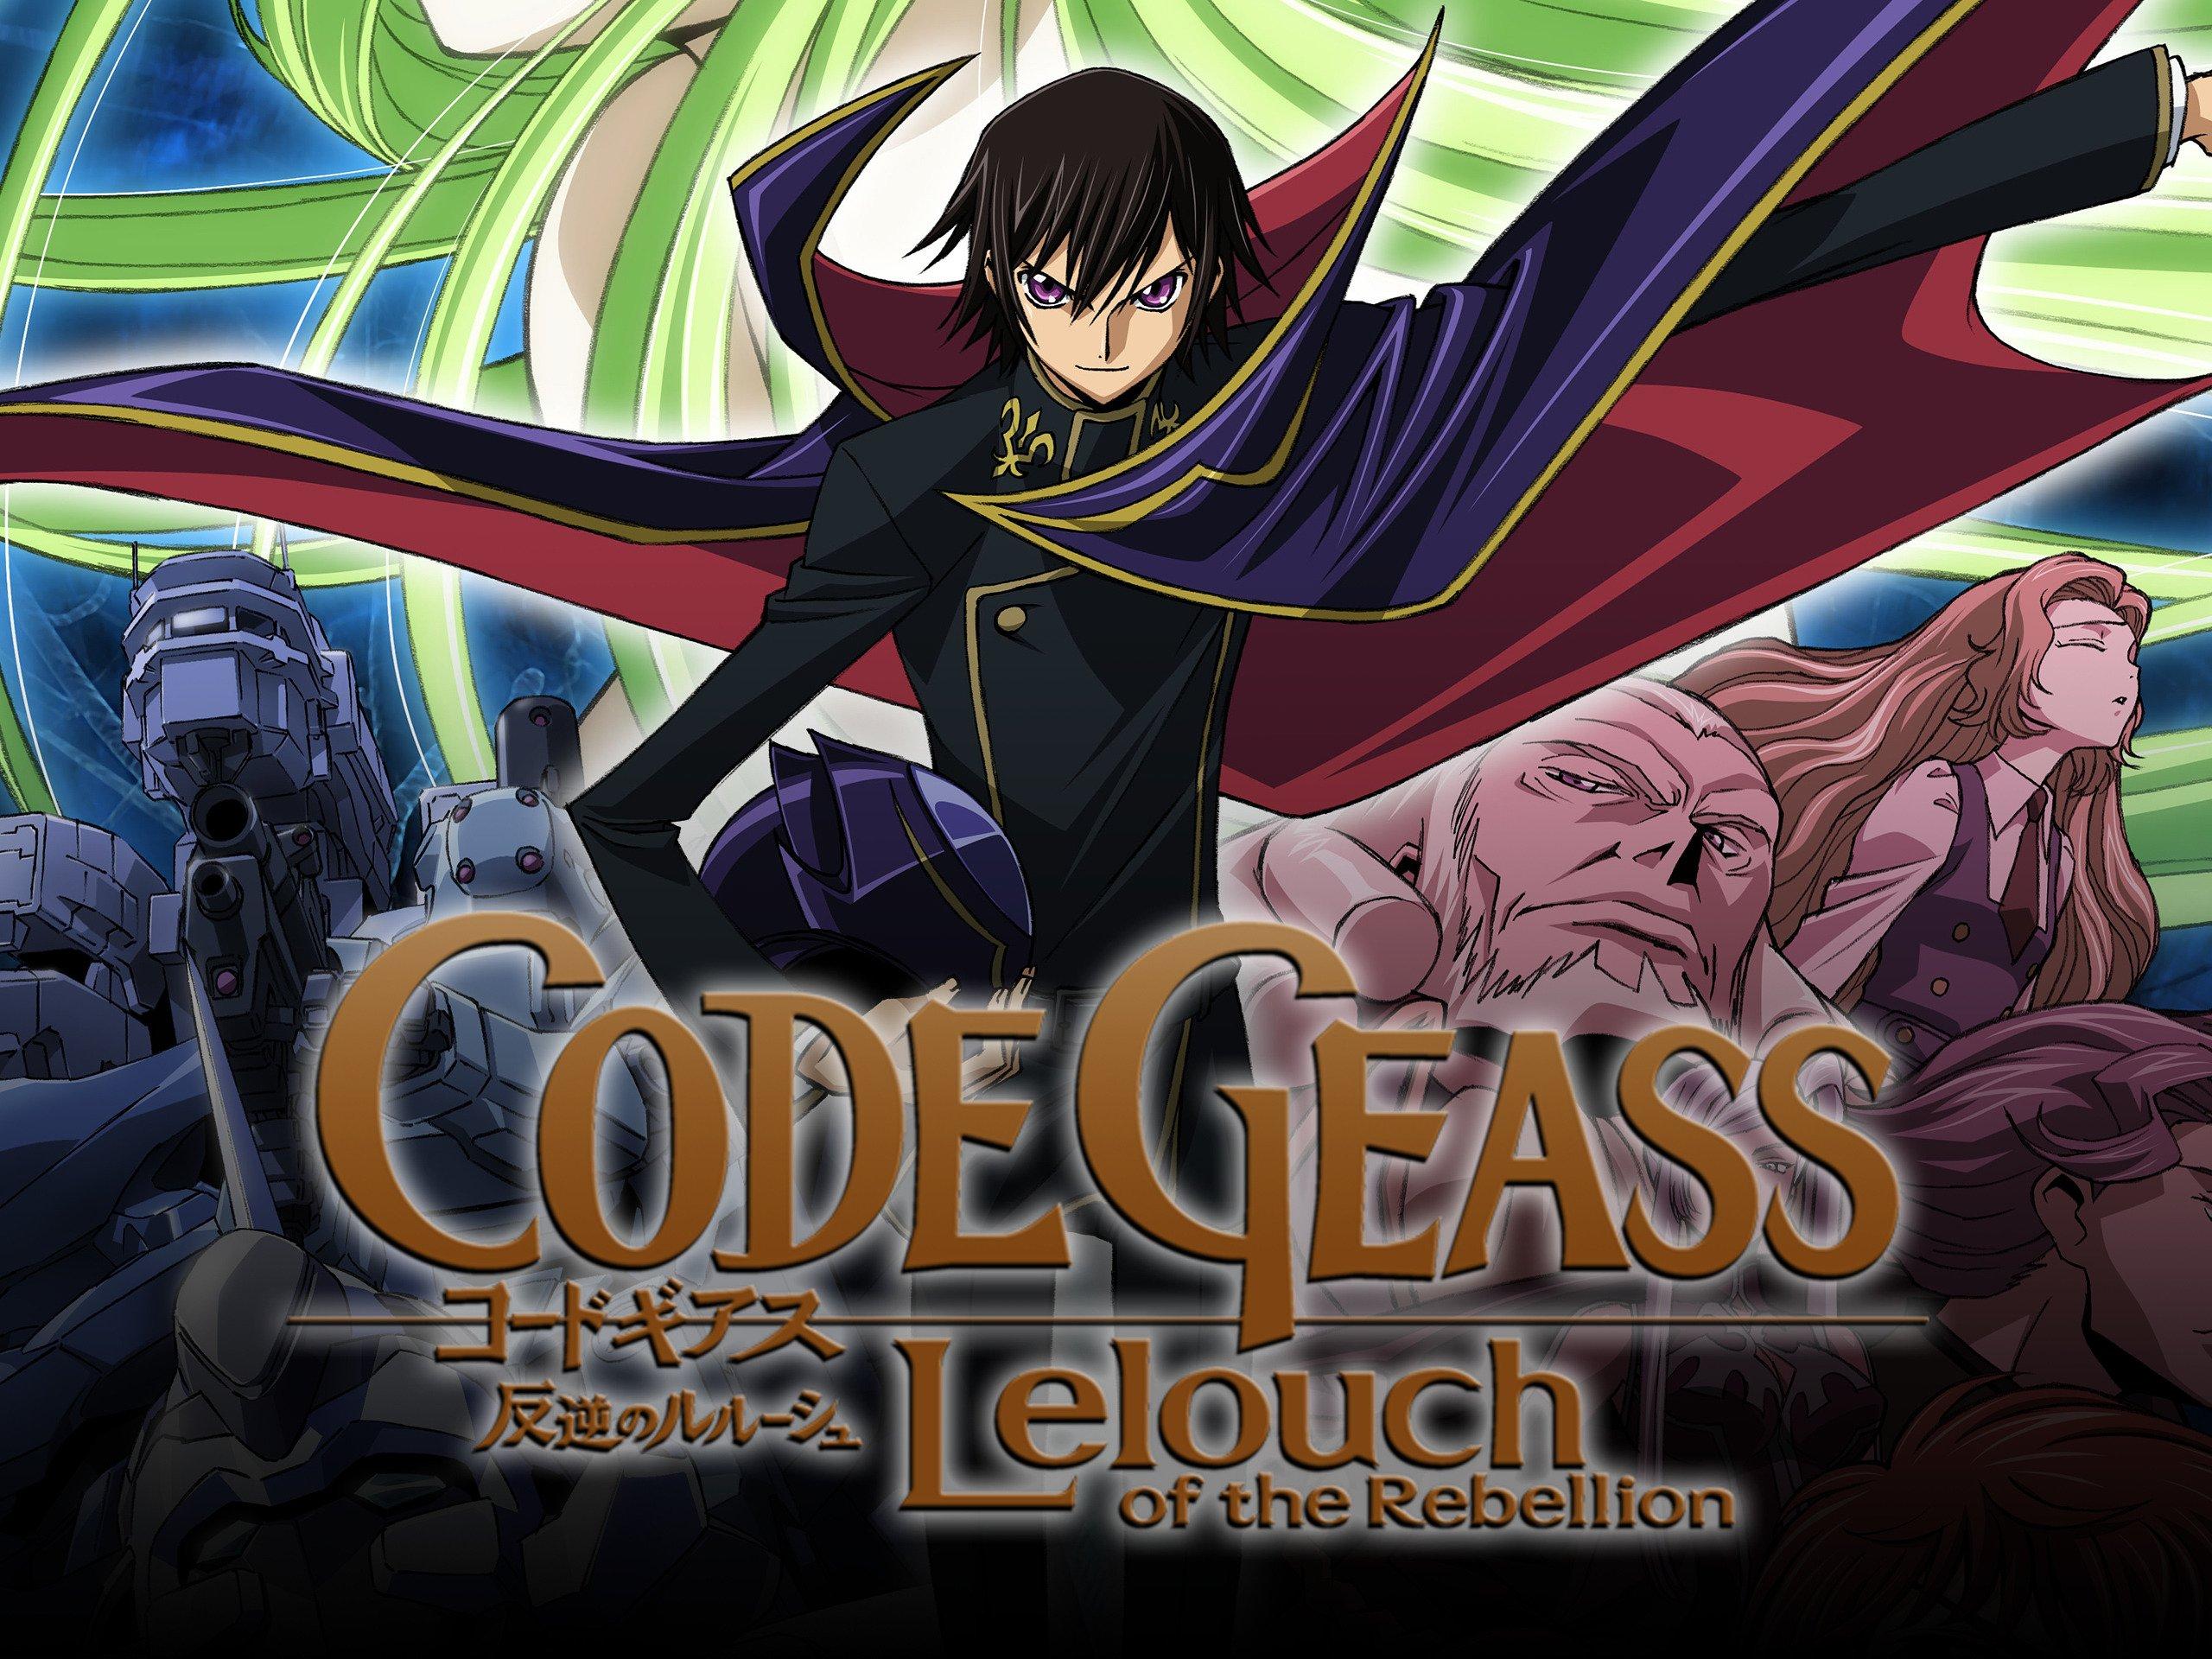 Watch Code Geass: Lelouch of the Rebellion, Season 1 | Prime Video